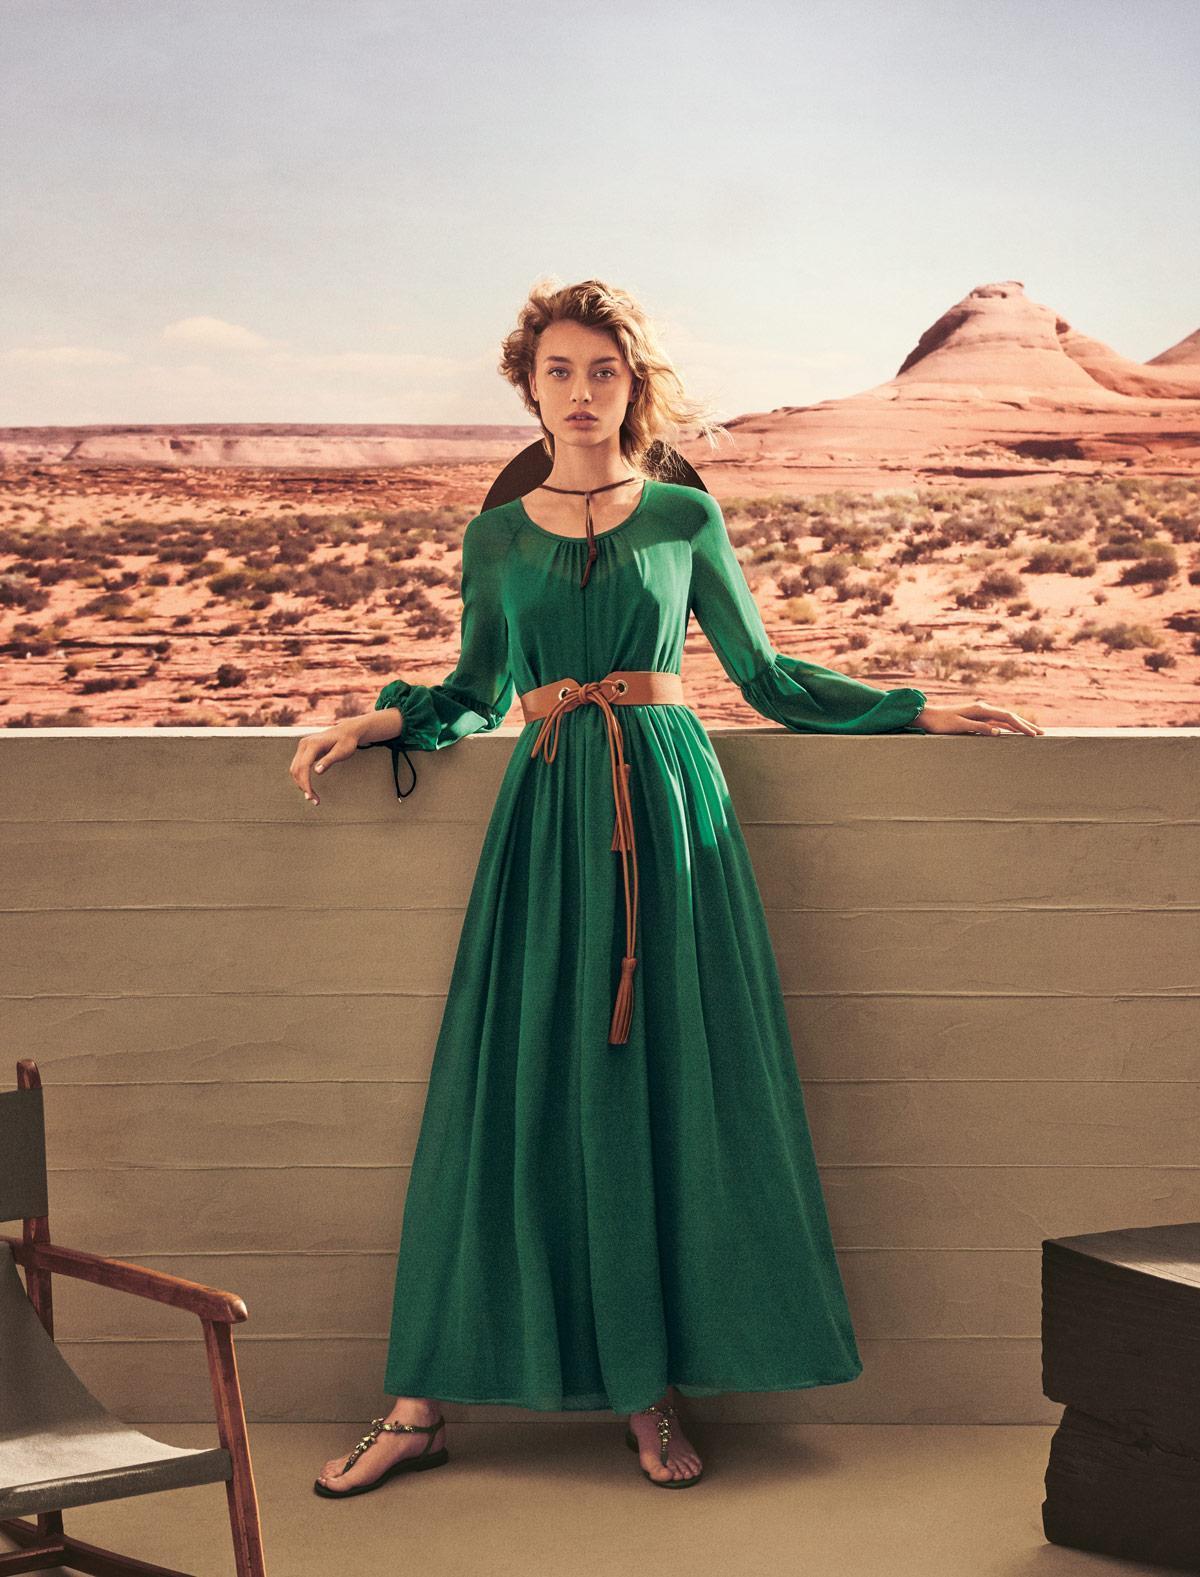 Vestito verde vintage